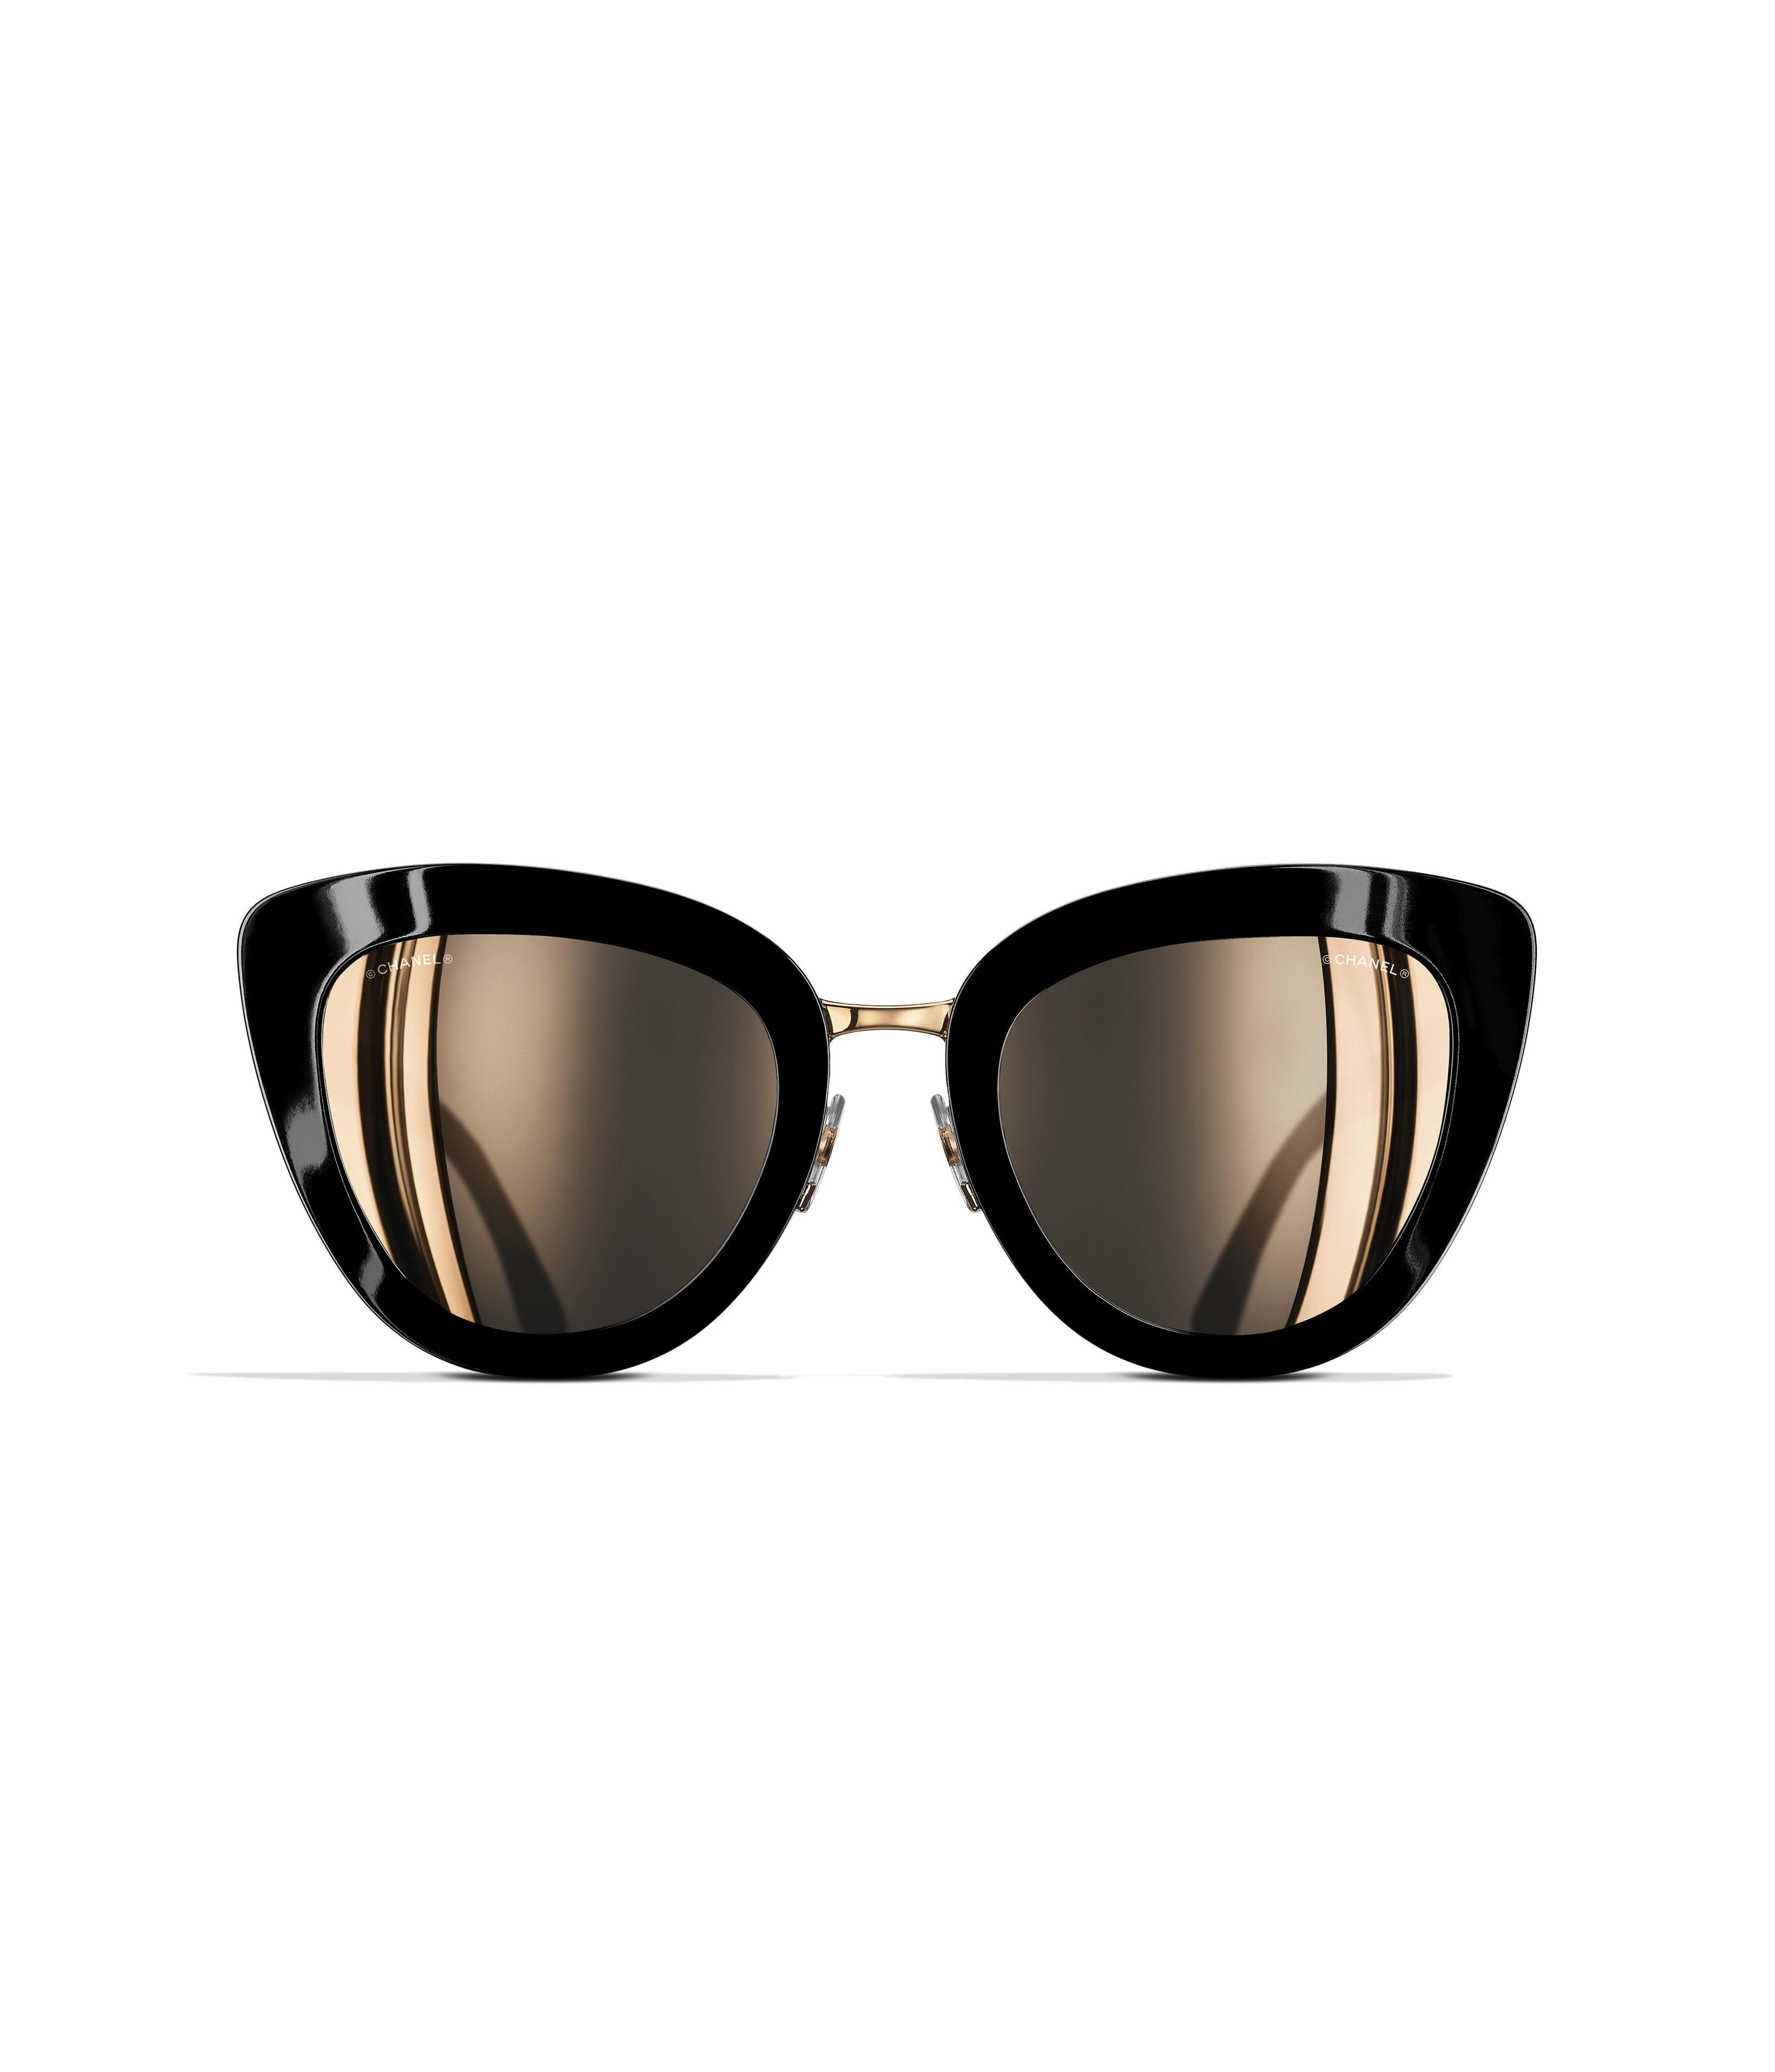 Katzenaugenförmige Sonnenbrille, azetat & metall, schwarz - CHANEL